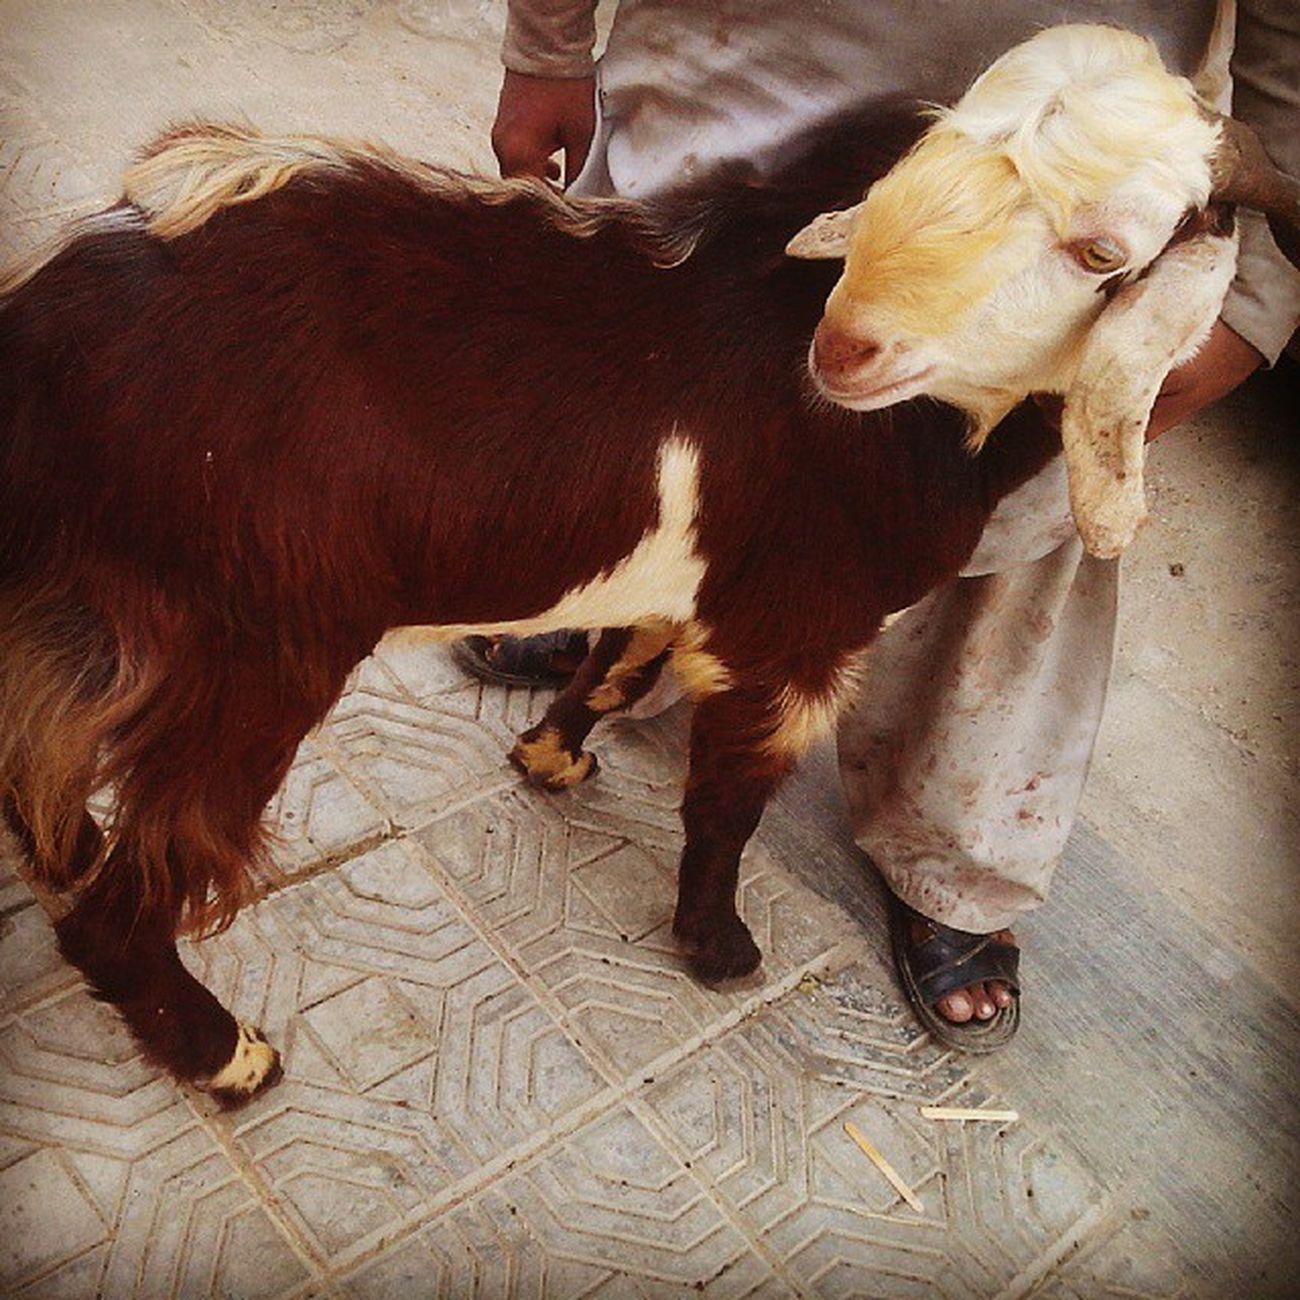 Eid Mubarak Eid Mubarak Eidmubarak Eiduladha sacrifice goat meat meatyeid bakra pakistan karachi butcher tikkaylagao